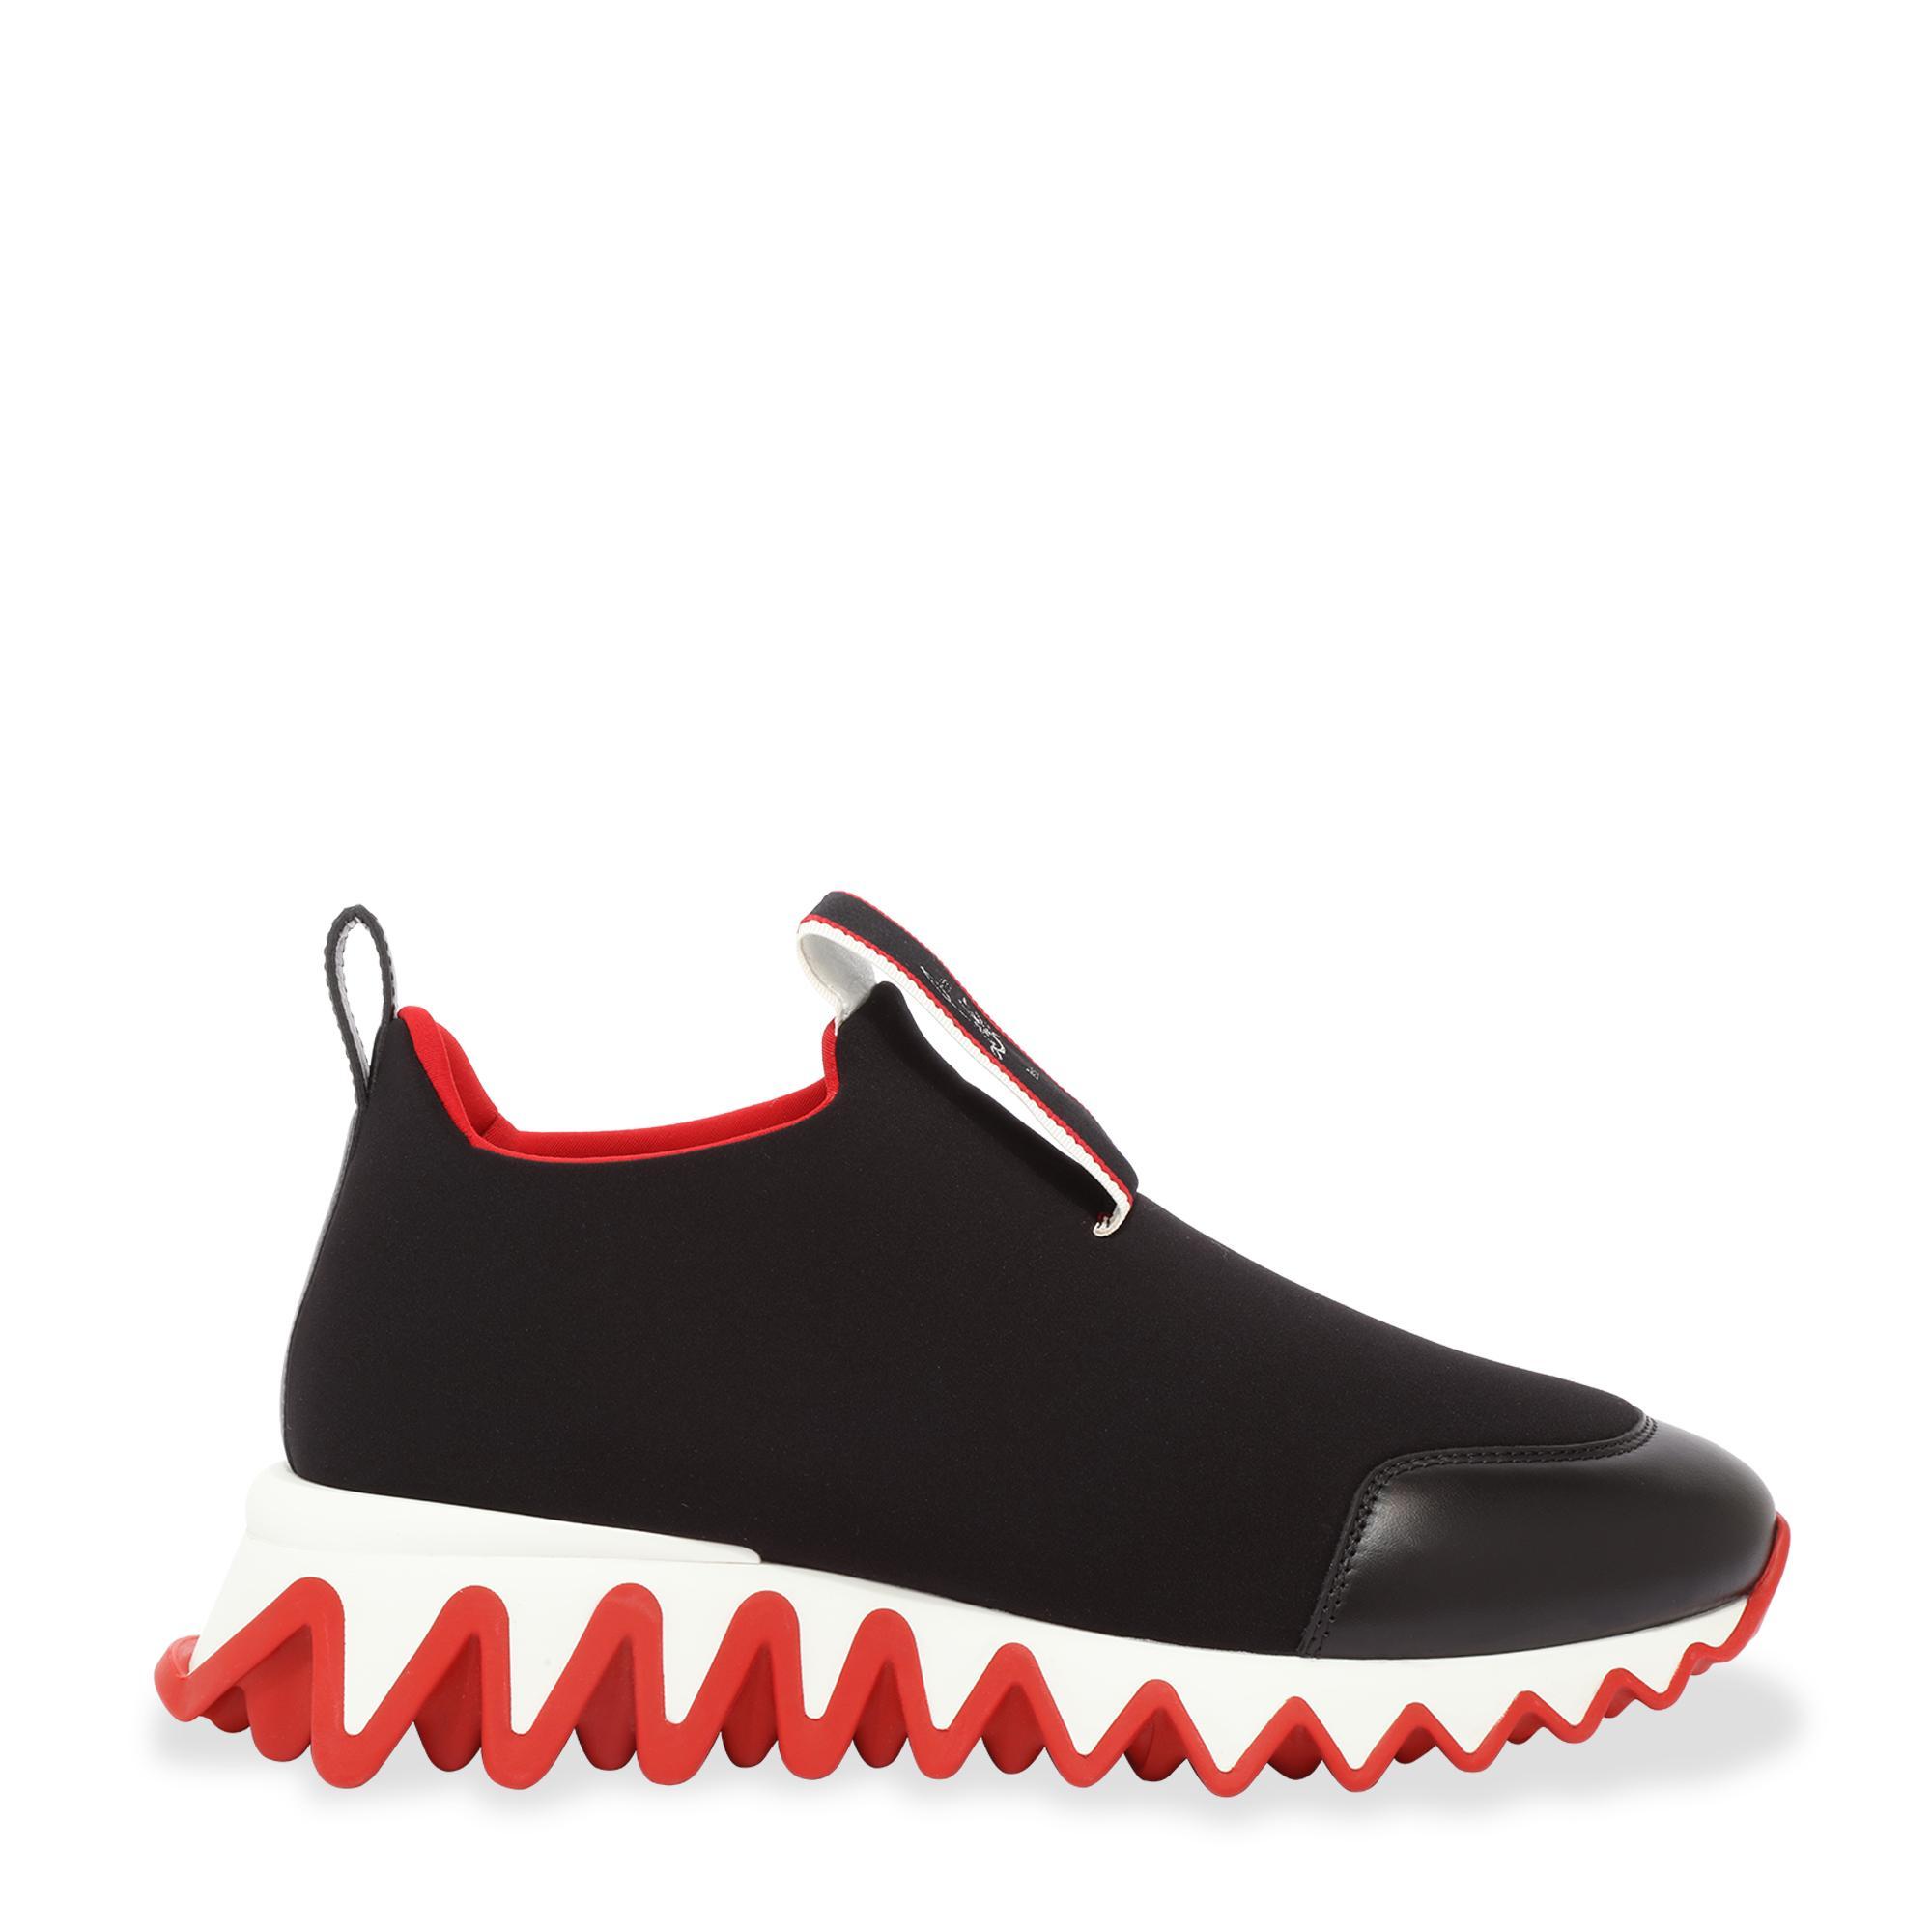 Tiketa Run sneakers